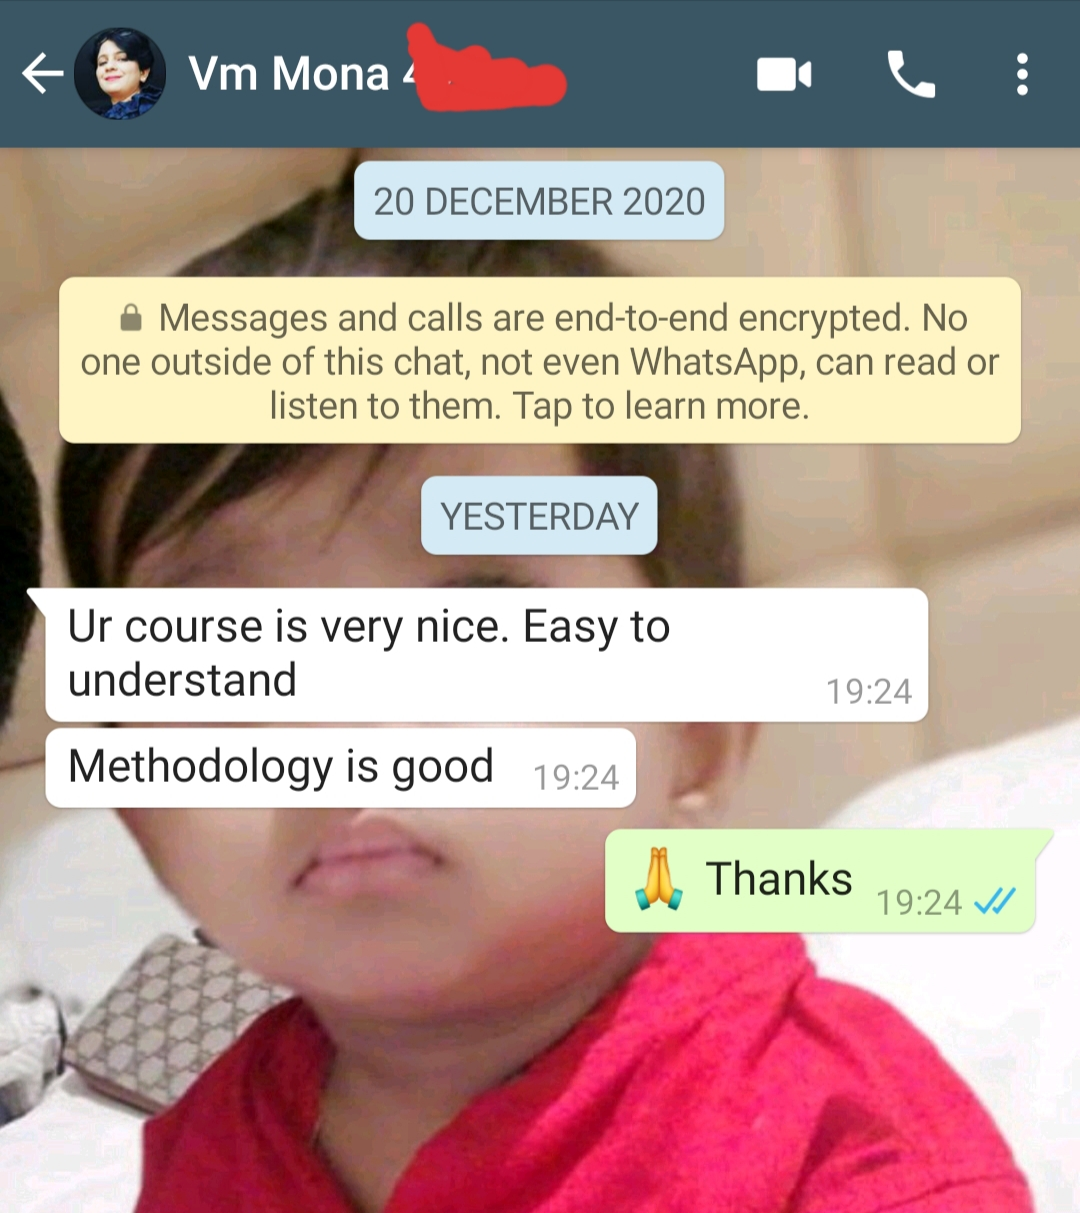 WhatsApp-Image-2020-12-25-at-6.13.39-PM